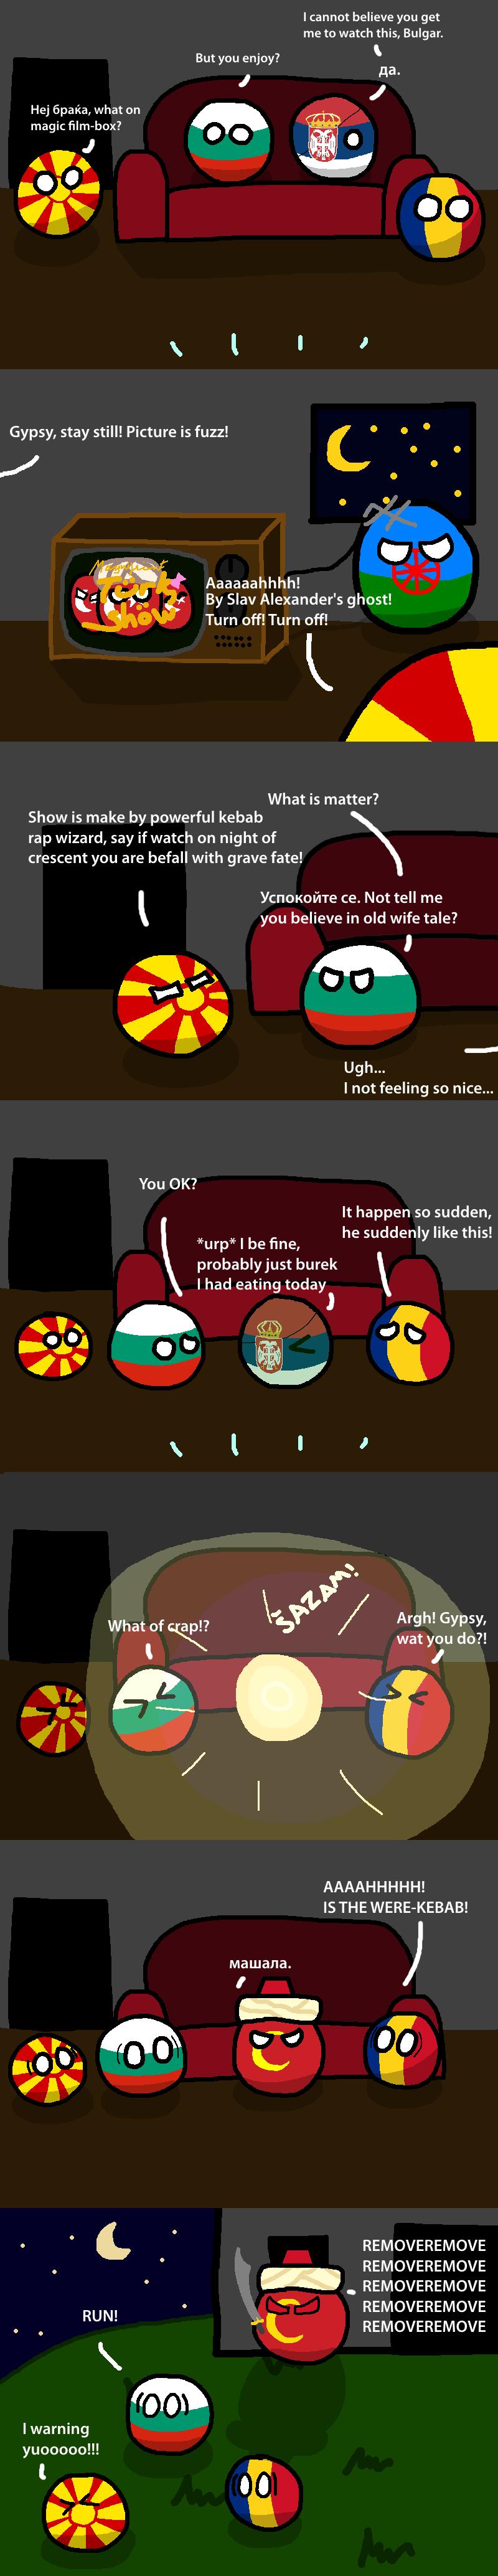 Kebab TV